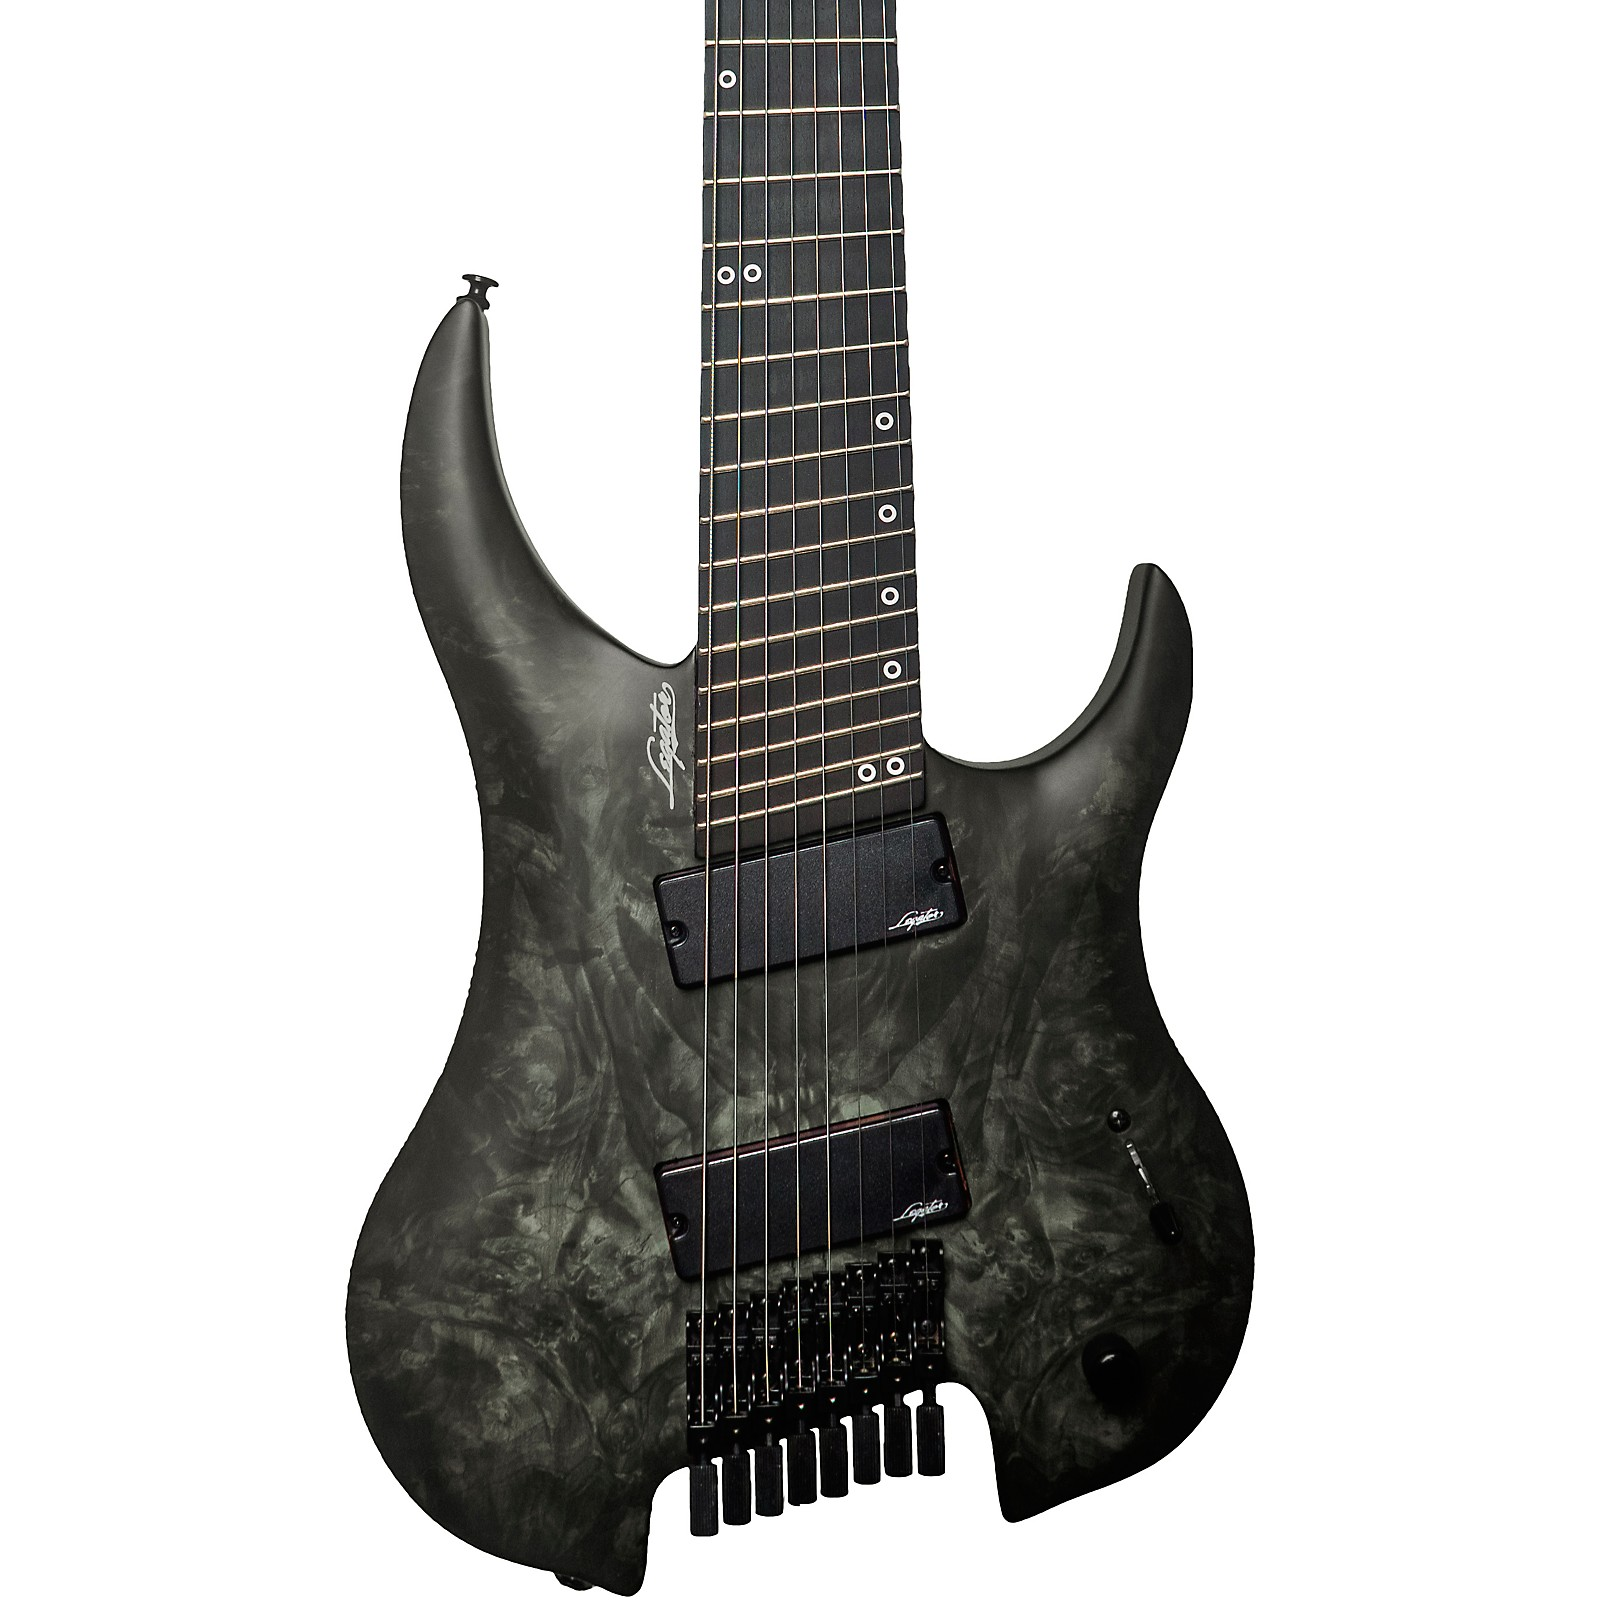 Legator Ghost Overdrive 8 Multi-Scale Electric Guitar